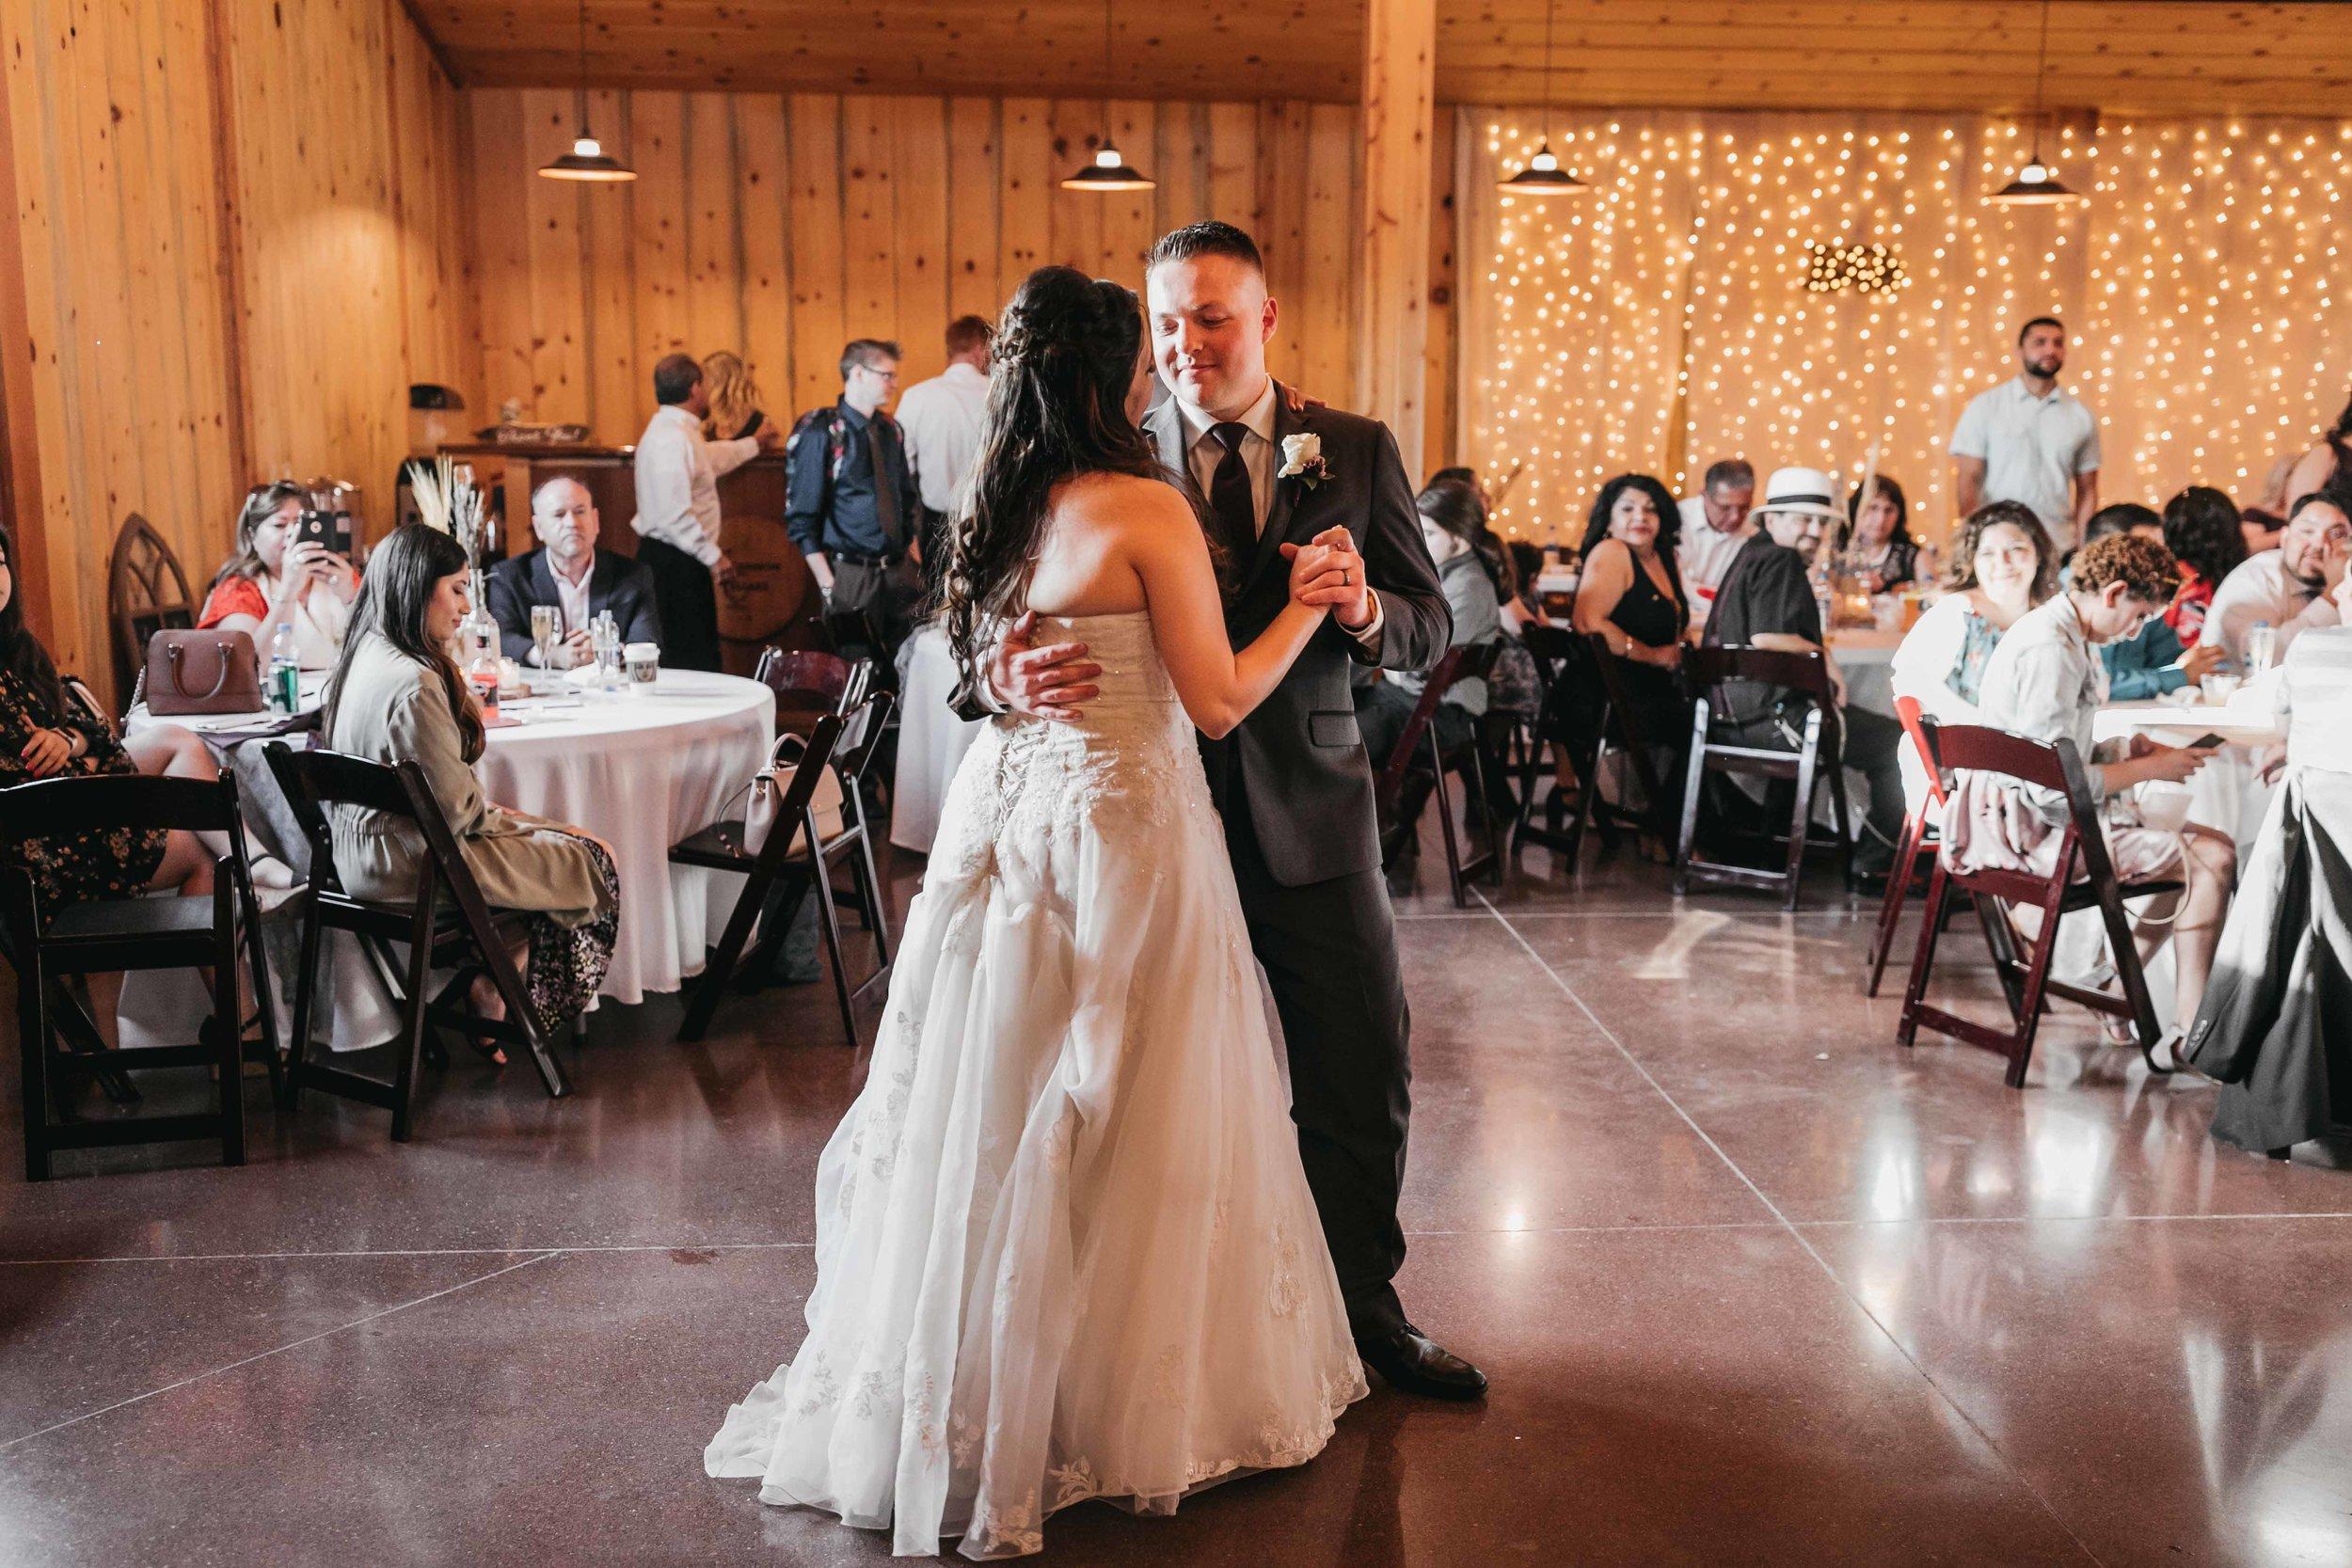 tuncannon-cellars-wedding-102.jpg